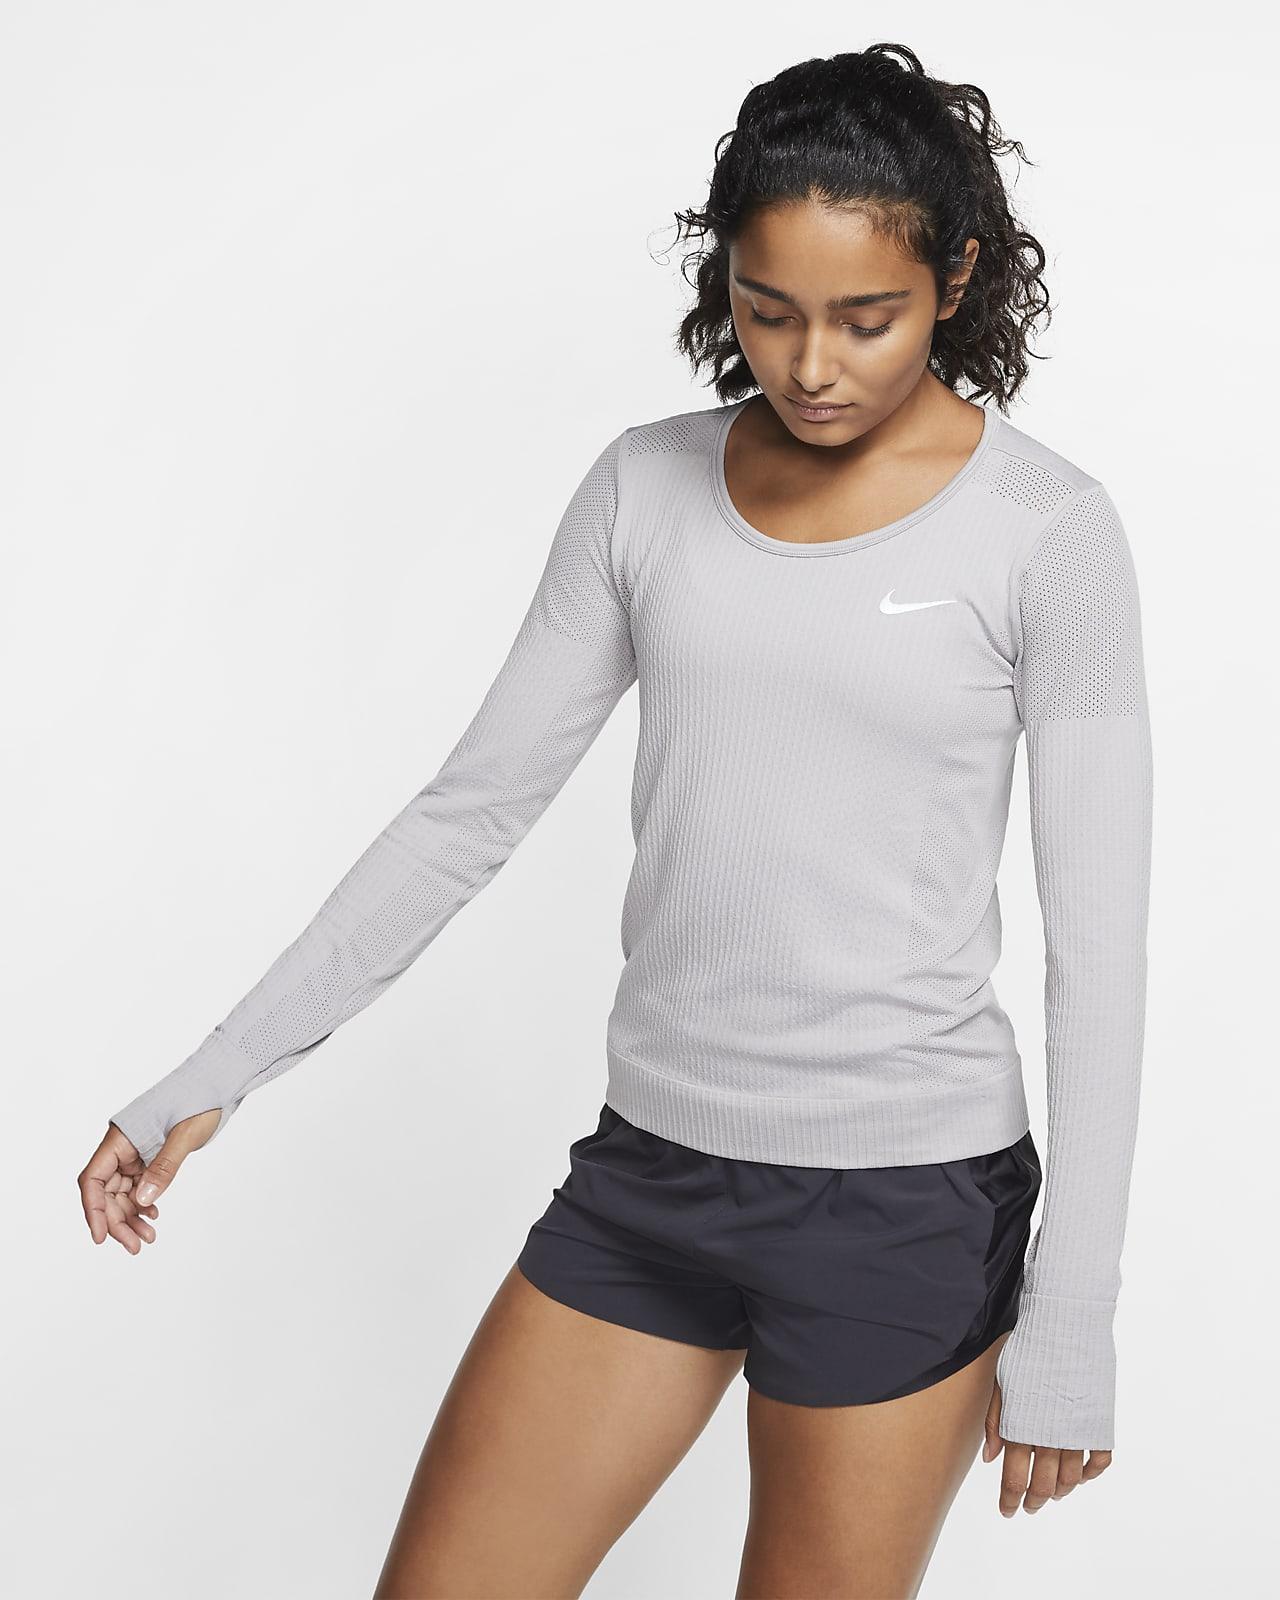 Long-Sleeve Running Top. Nike